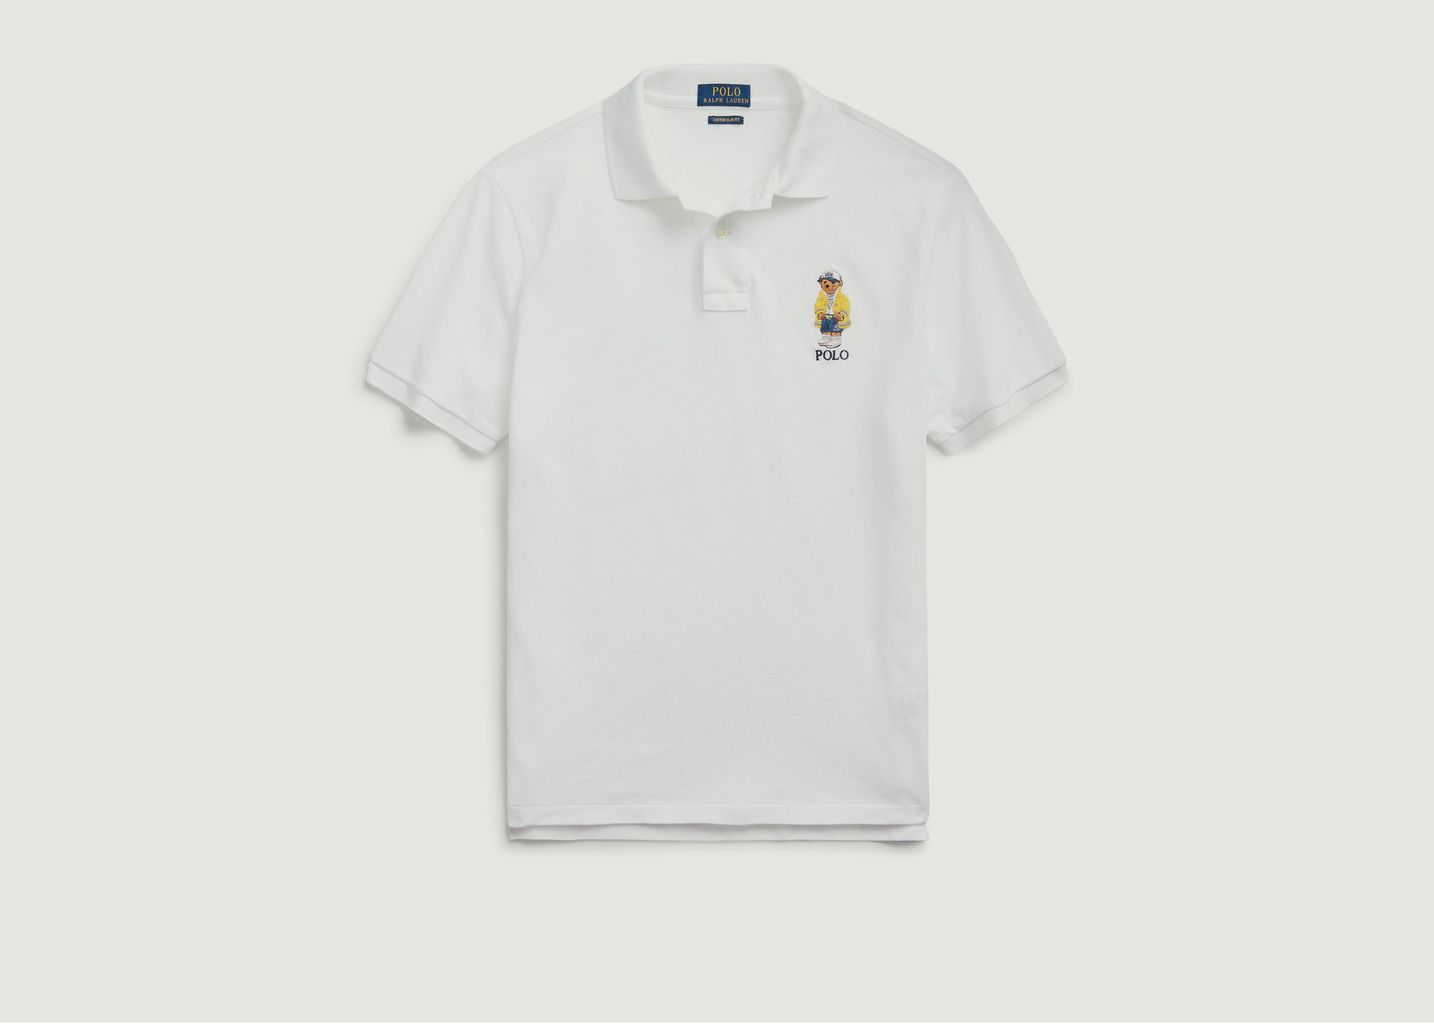 Polo Brodé Ours - Polo Ralph Lauren